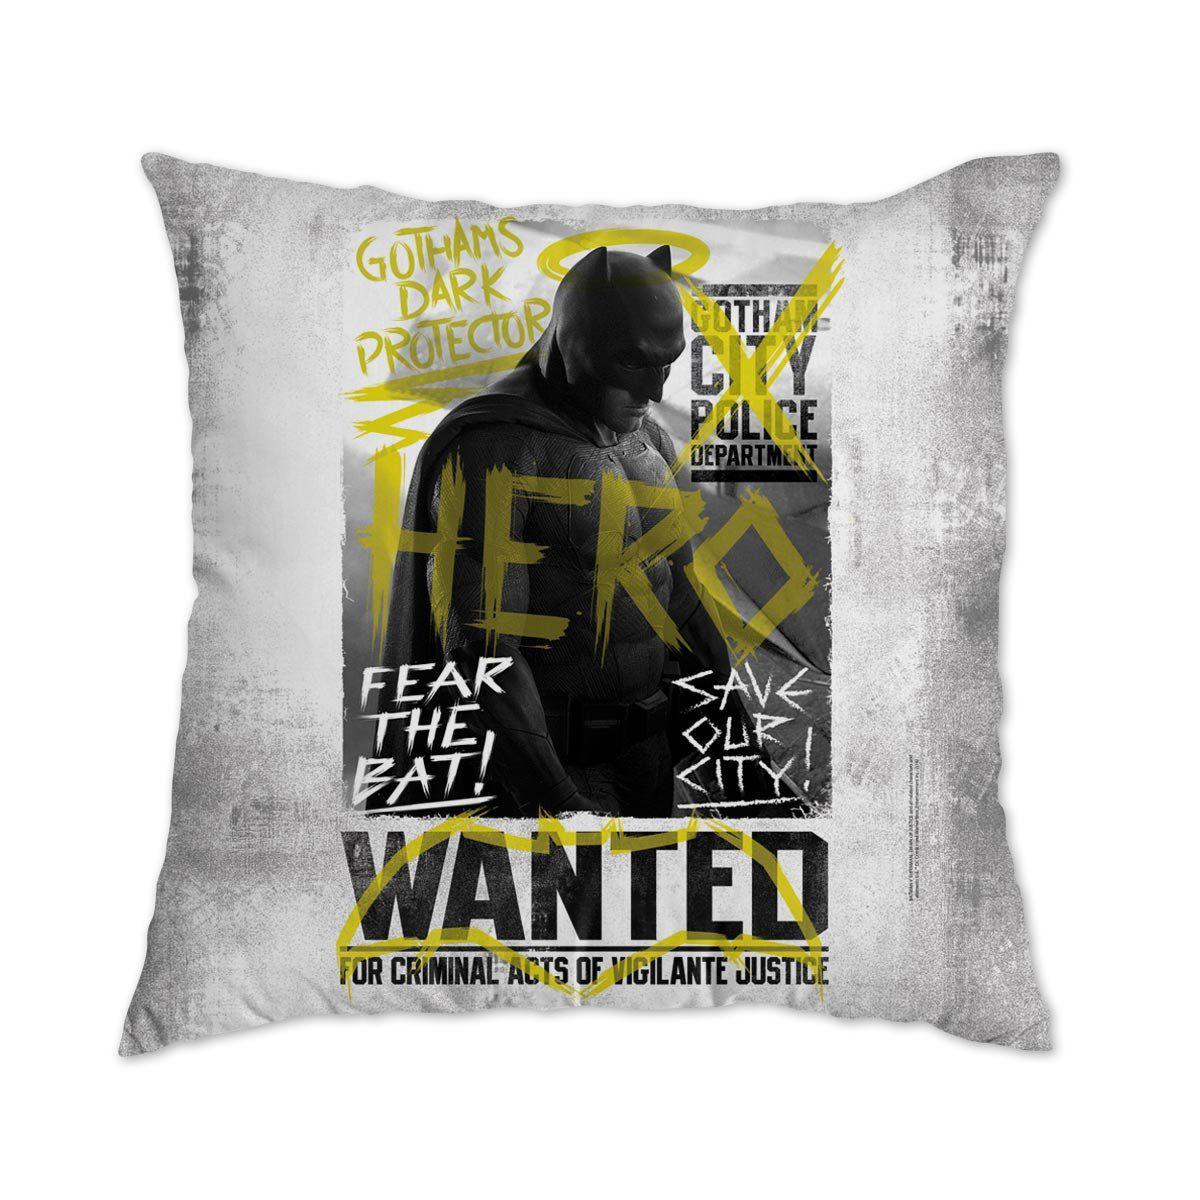 Almofada Batman VS Superman Hero Wanted  - bandUP Store Marketplace